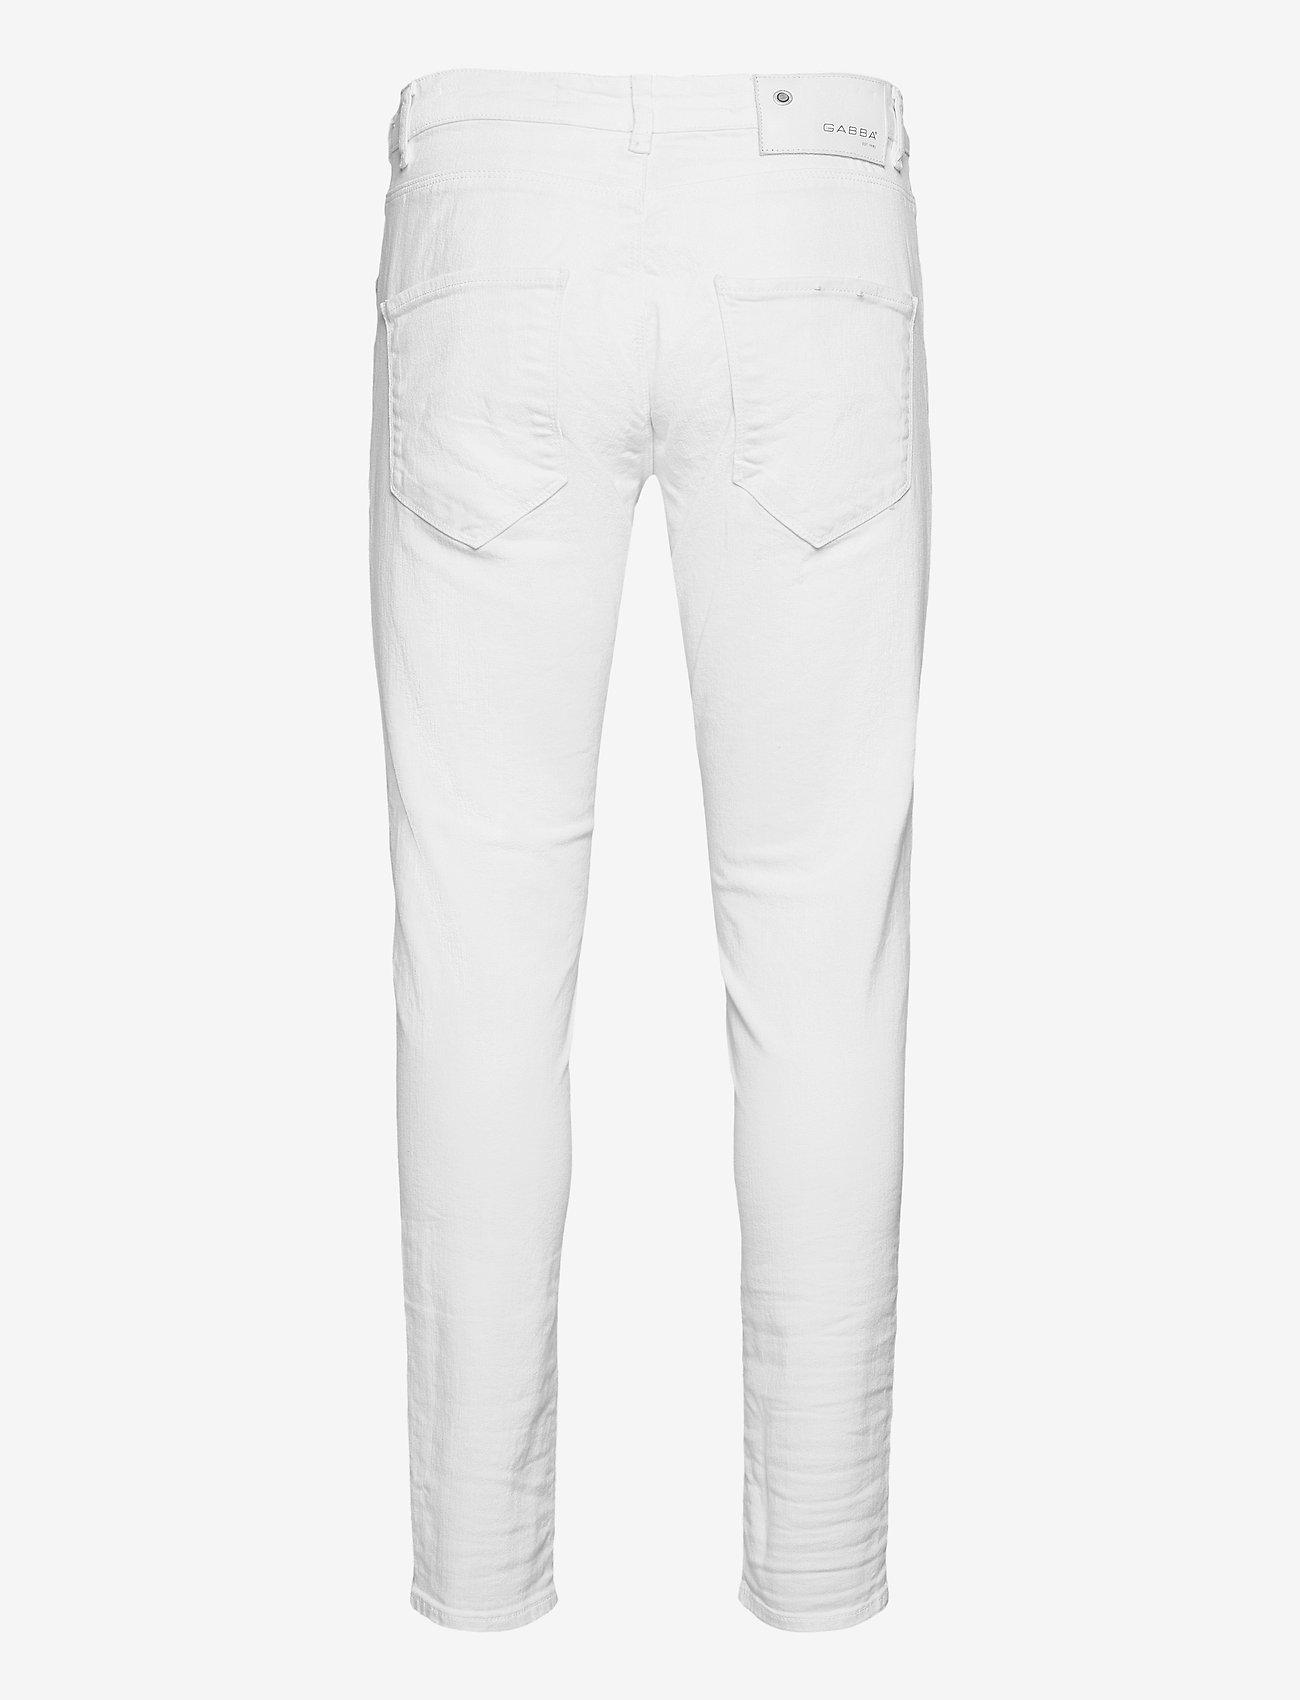 Gabba - Rey K2671 Jeans - slim jeans - rs1101 - 1